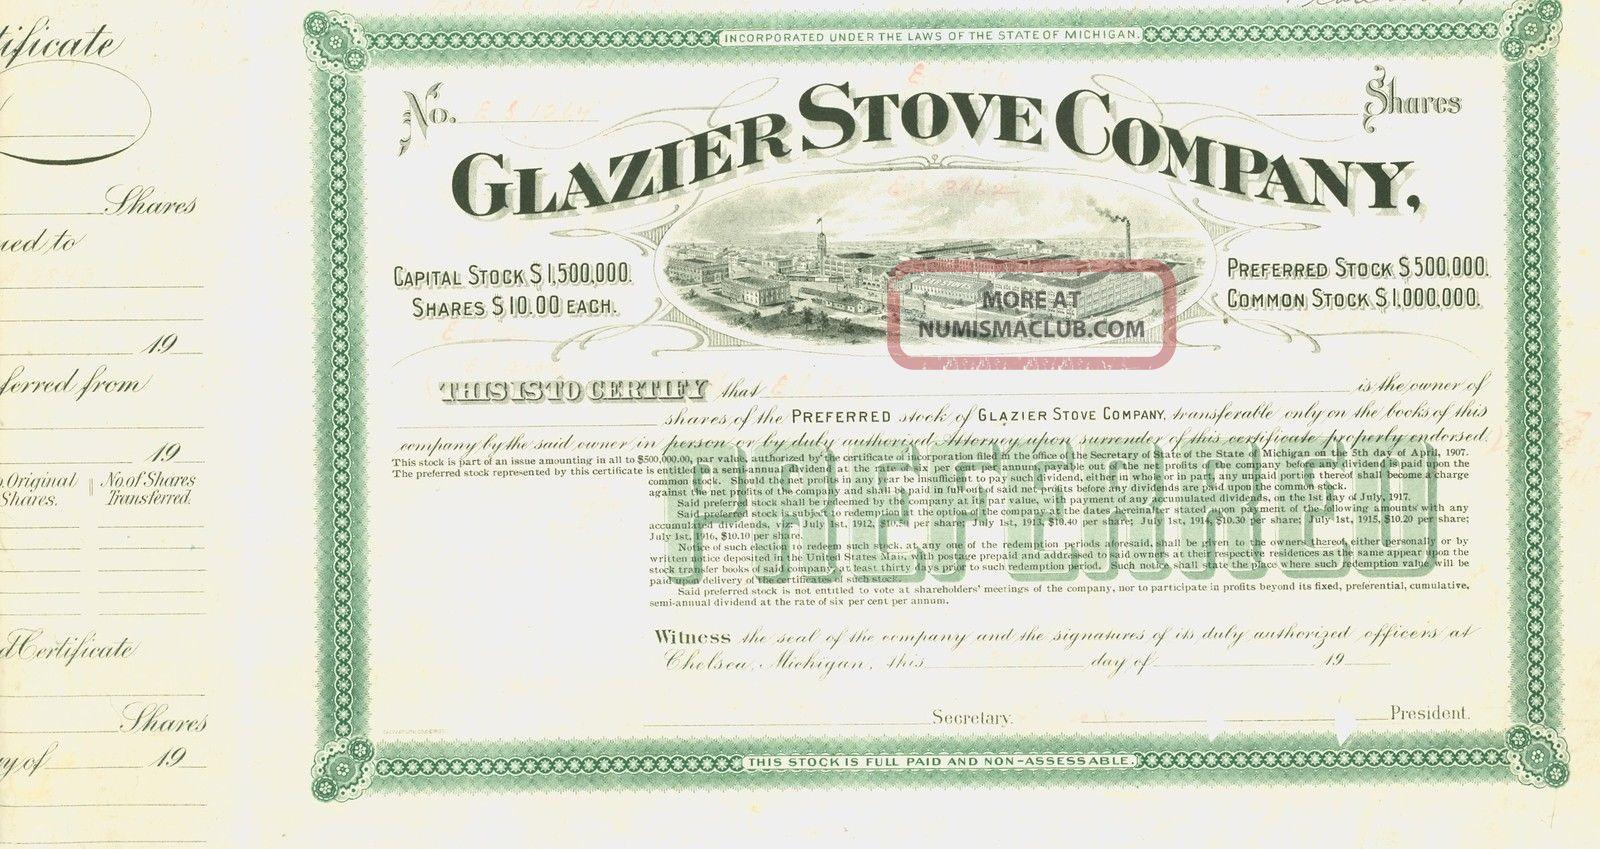 Glazier Stove Company - Unissued Stock Certificate - Printer Mark Up Copy Stocks & Bonds, Scripophily photo